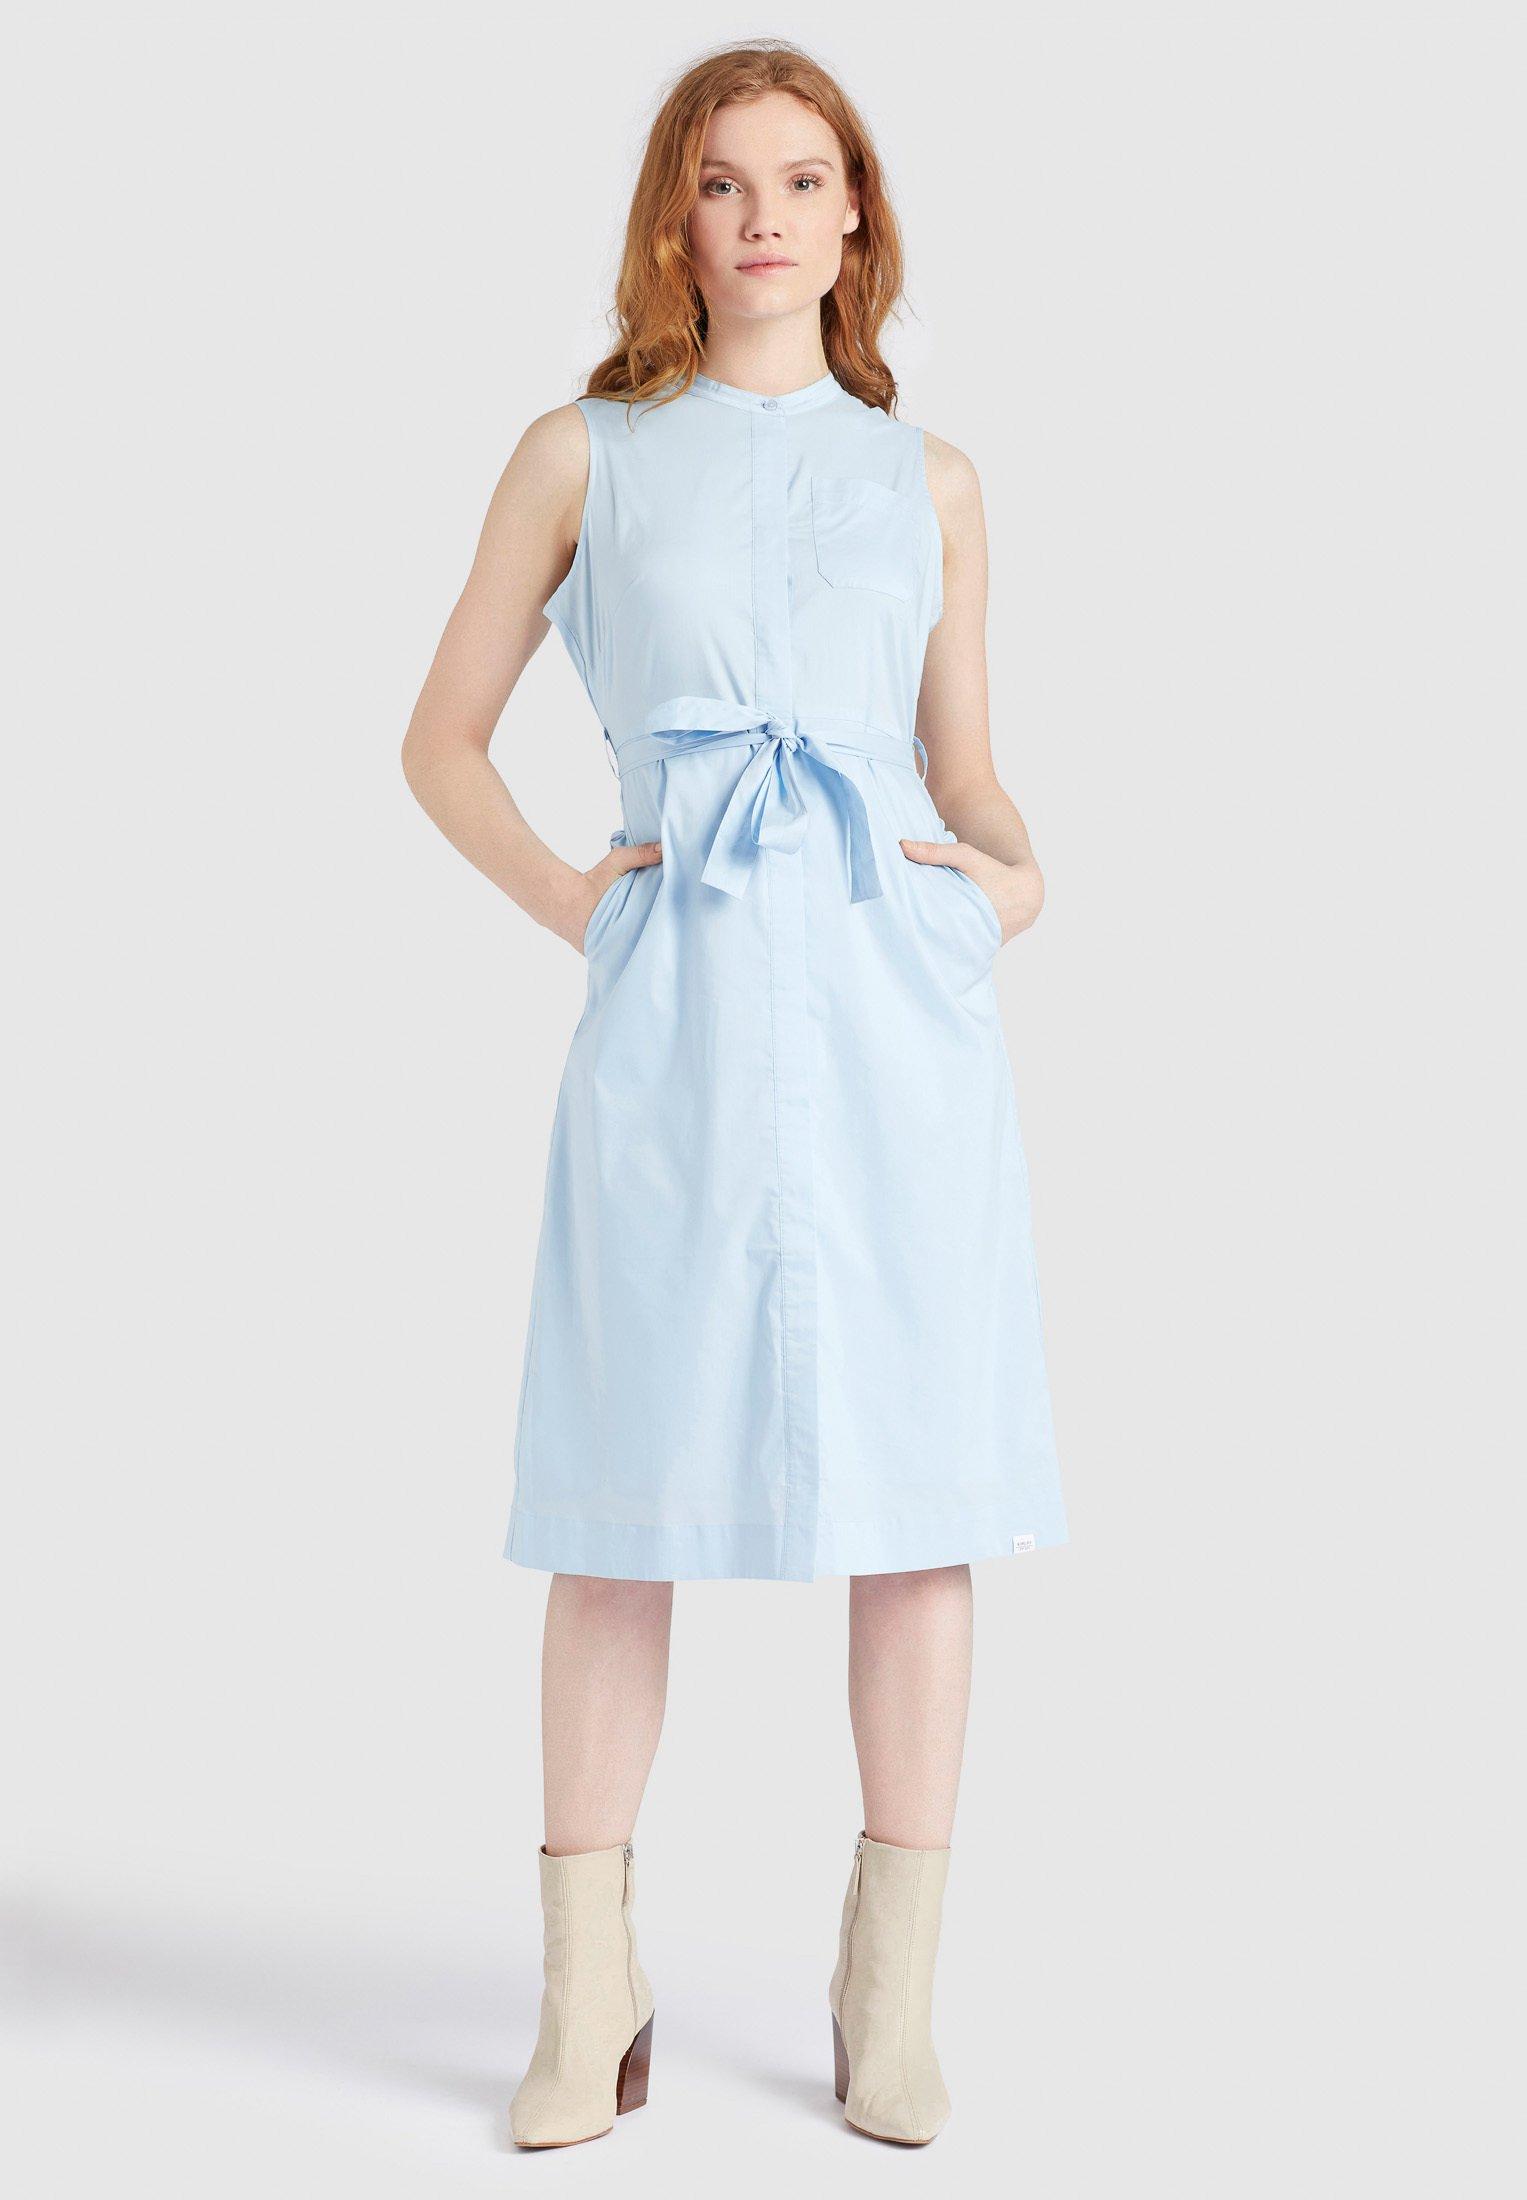 khujo THERES - Robe chemise - hellblau - Robes femme scGsG